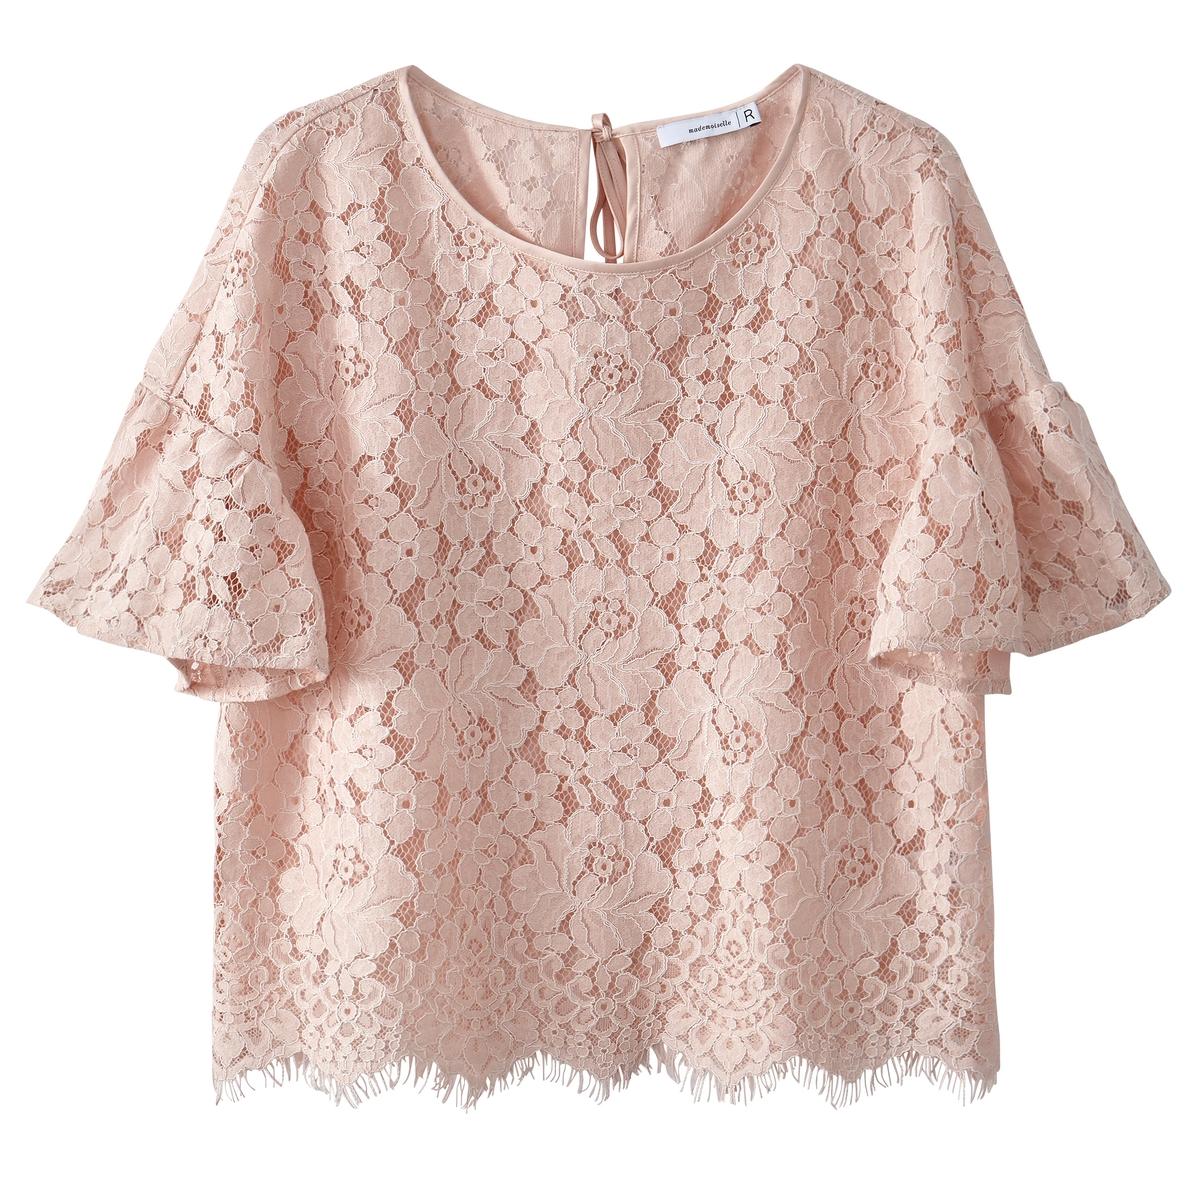 Блузка кружевная с воланами на рукавах